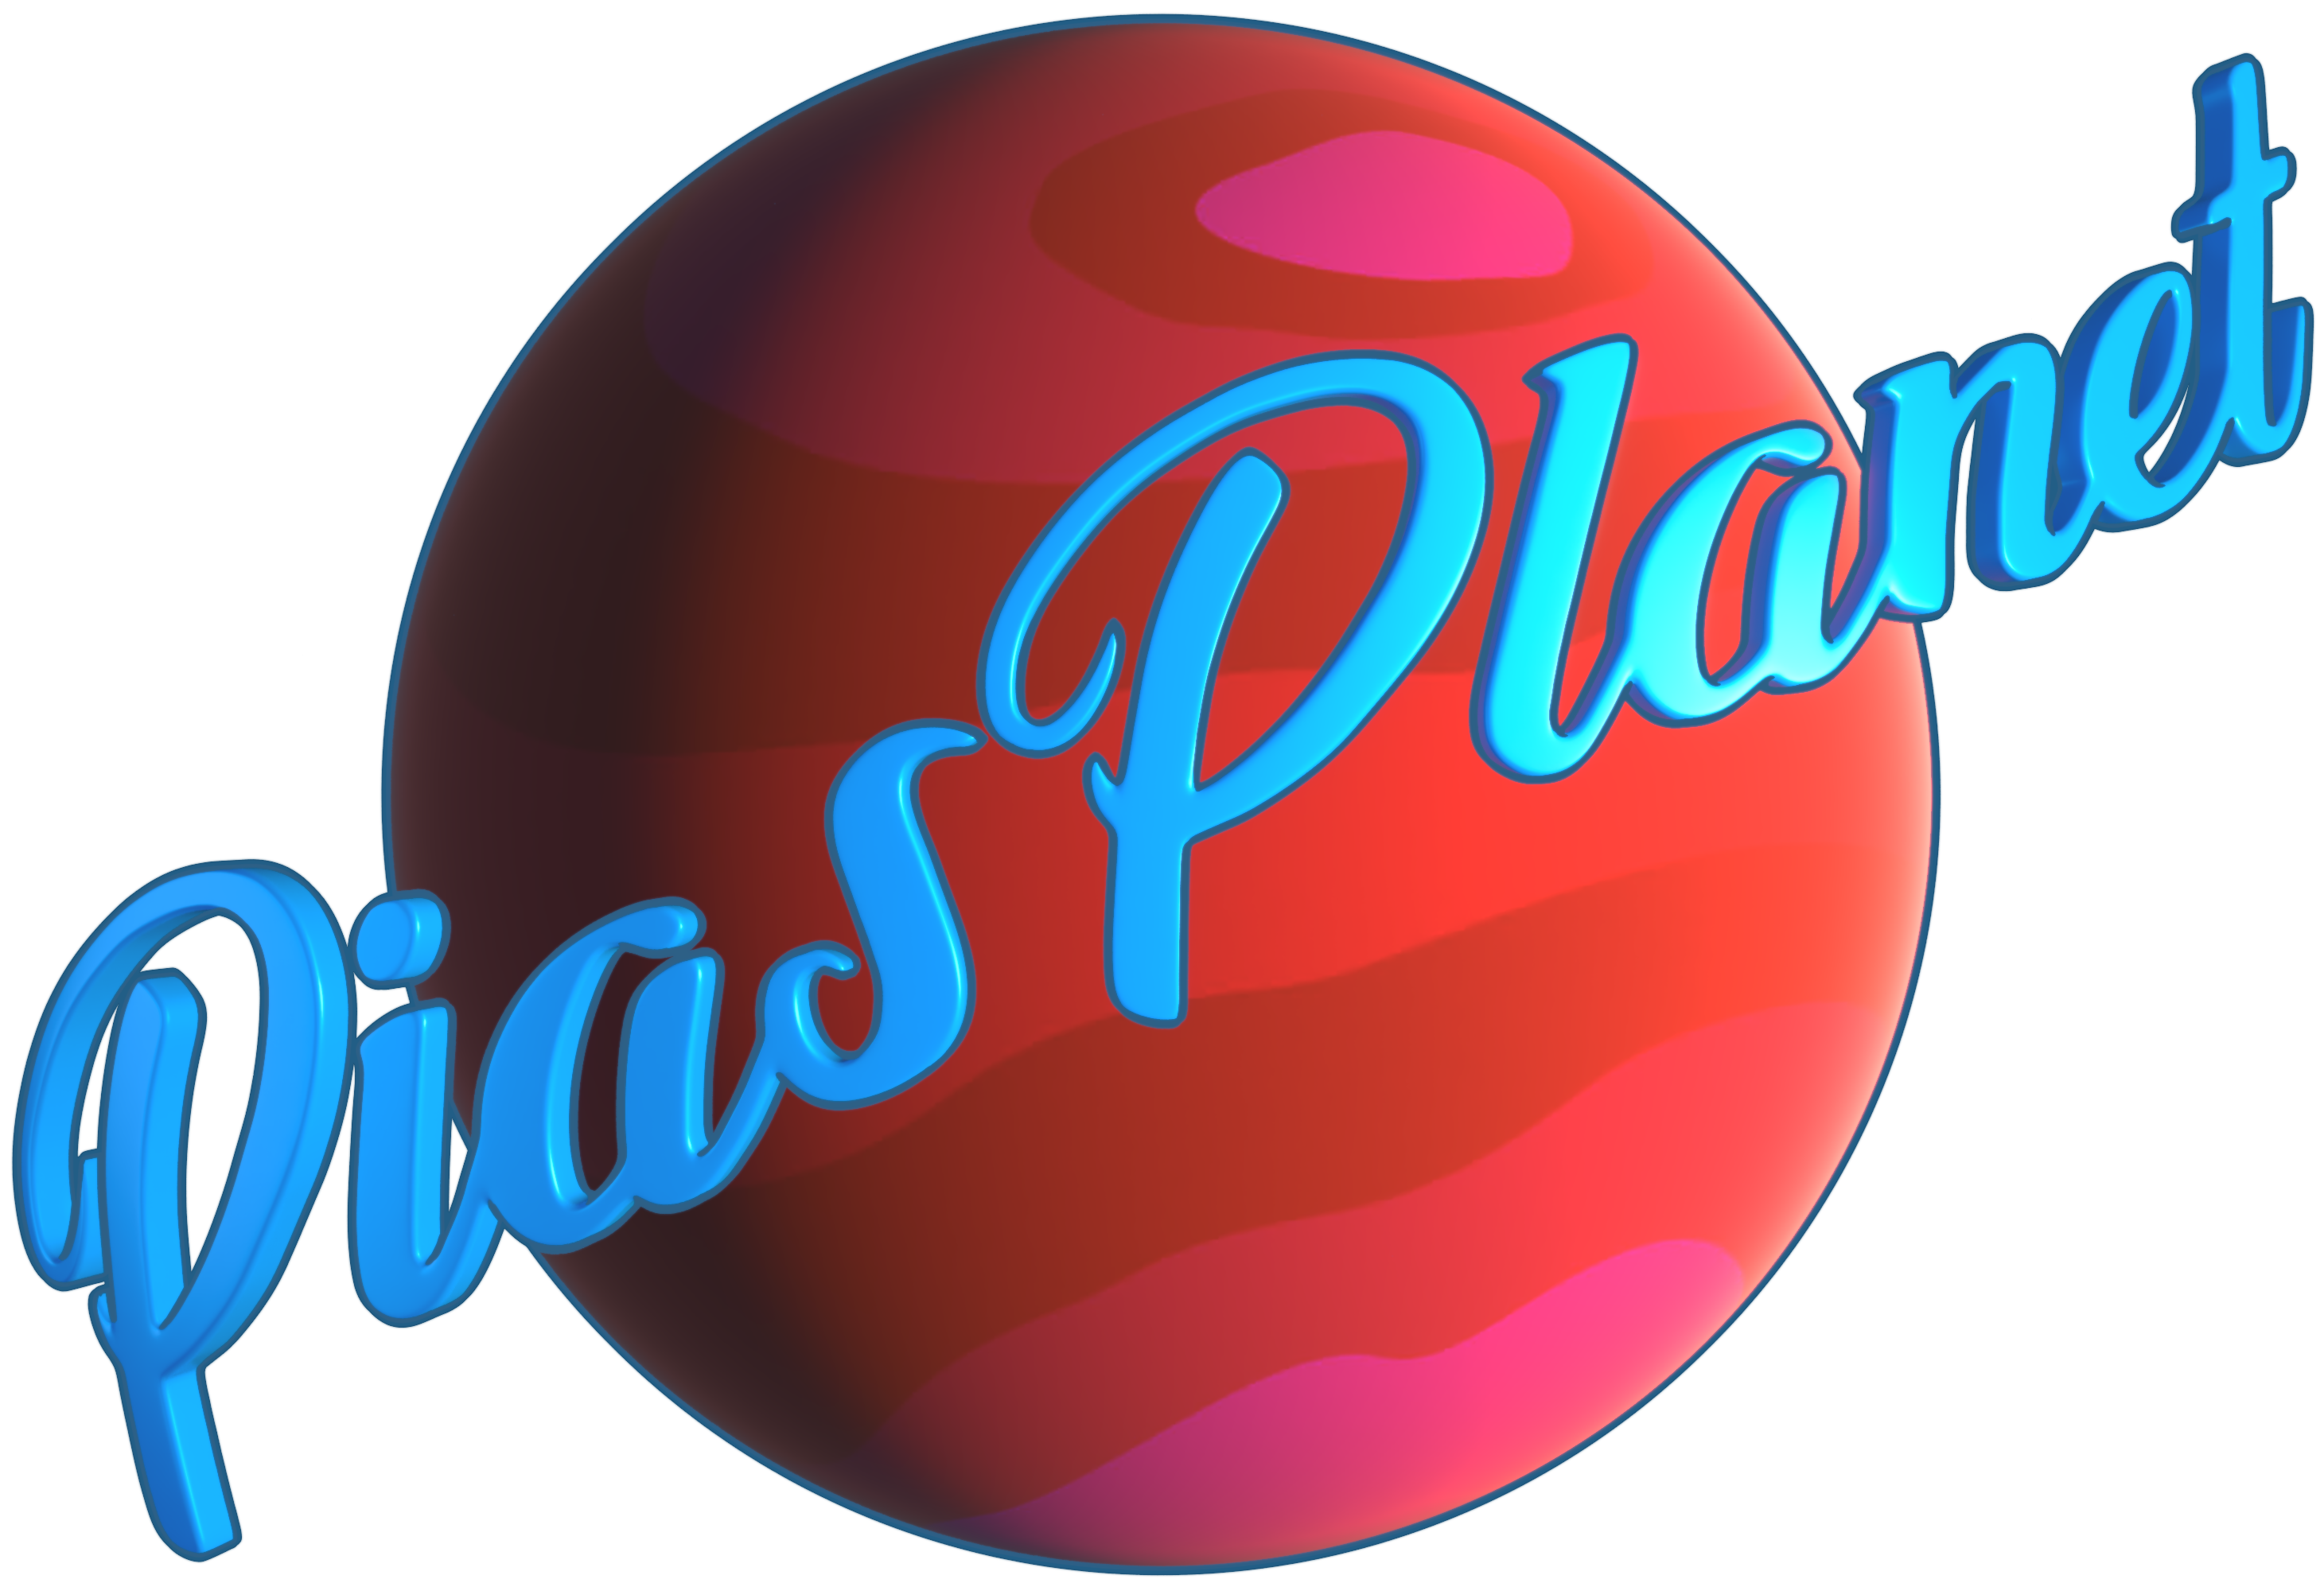 Pias Planet